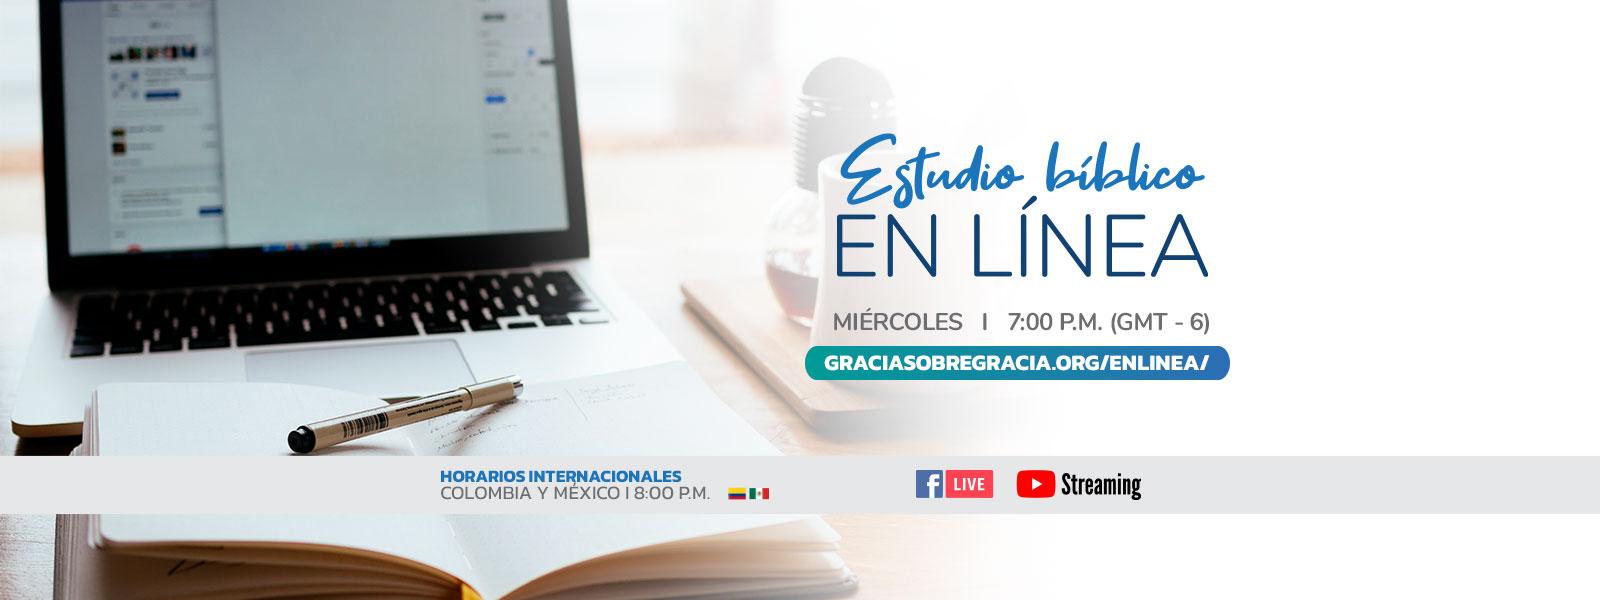 Iglesia Gracia Sobre Gracia | Estudio Bíblico En Línea